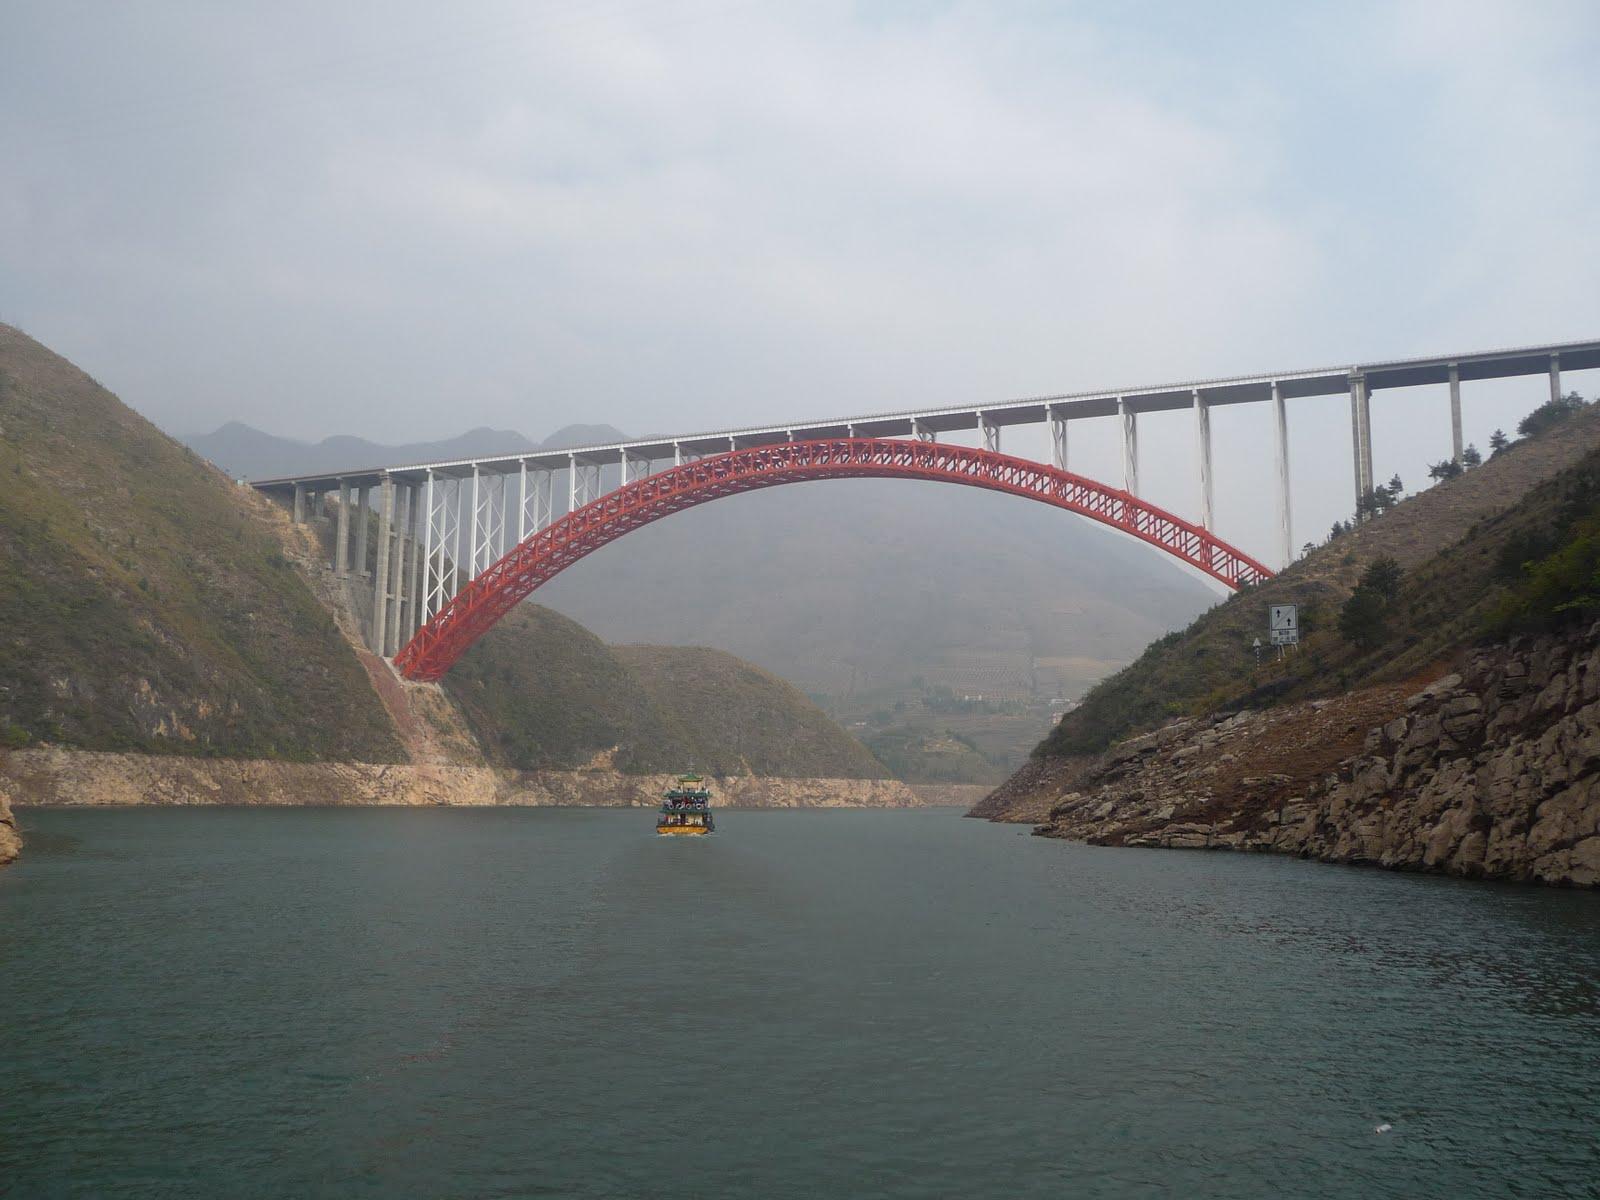 bridge on the river - photo #39